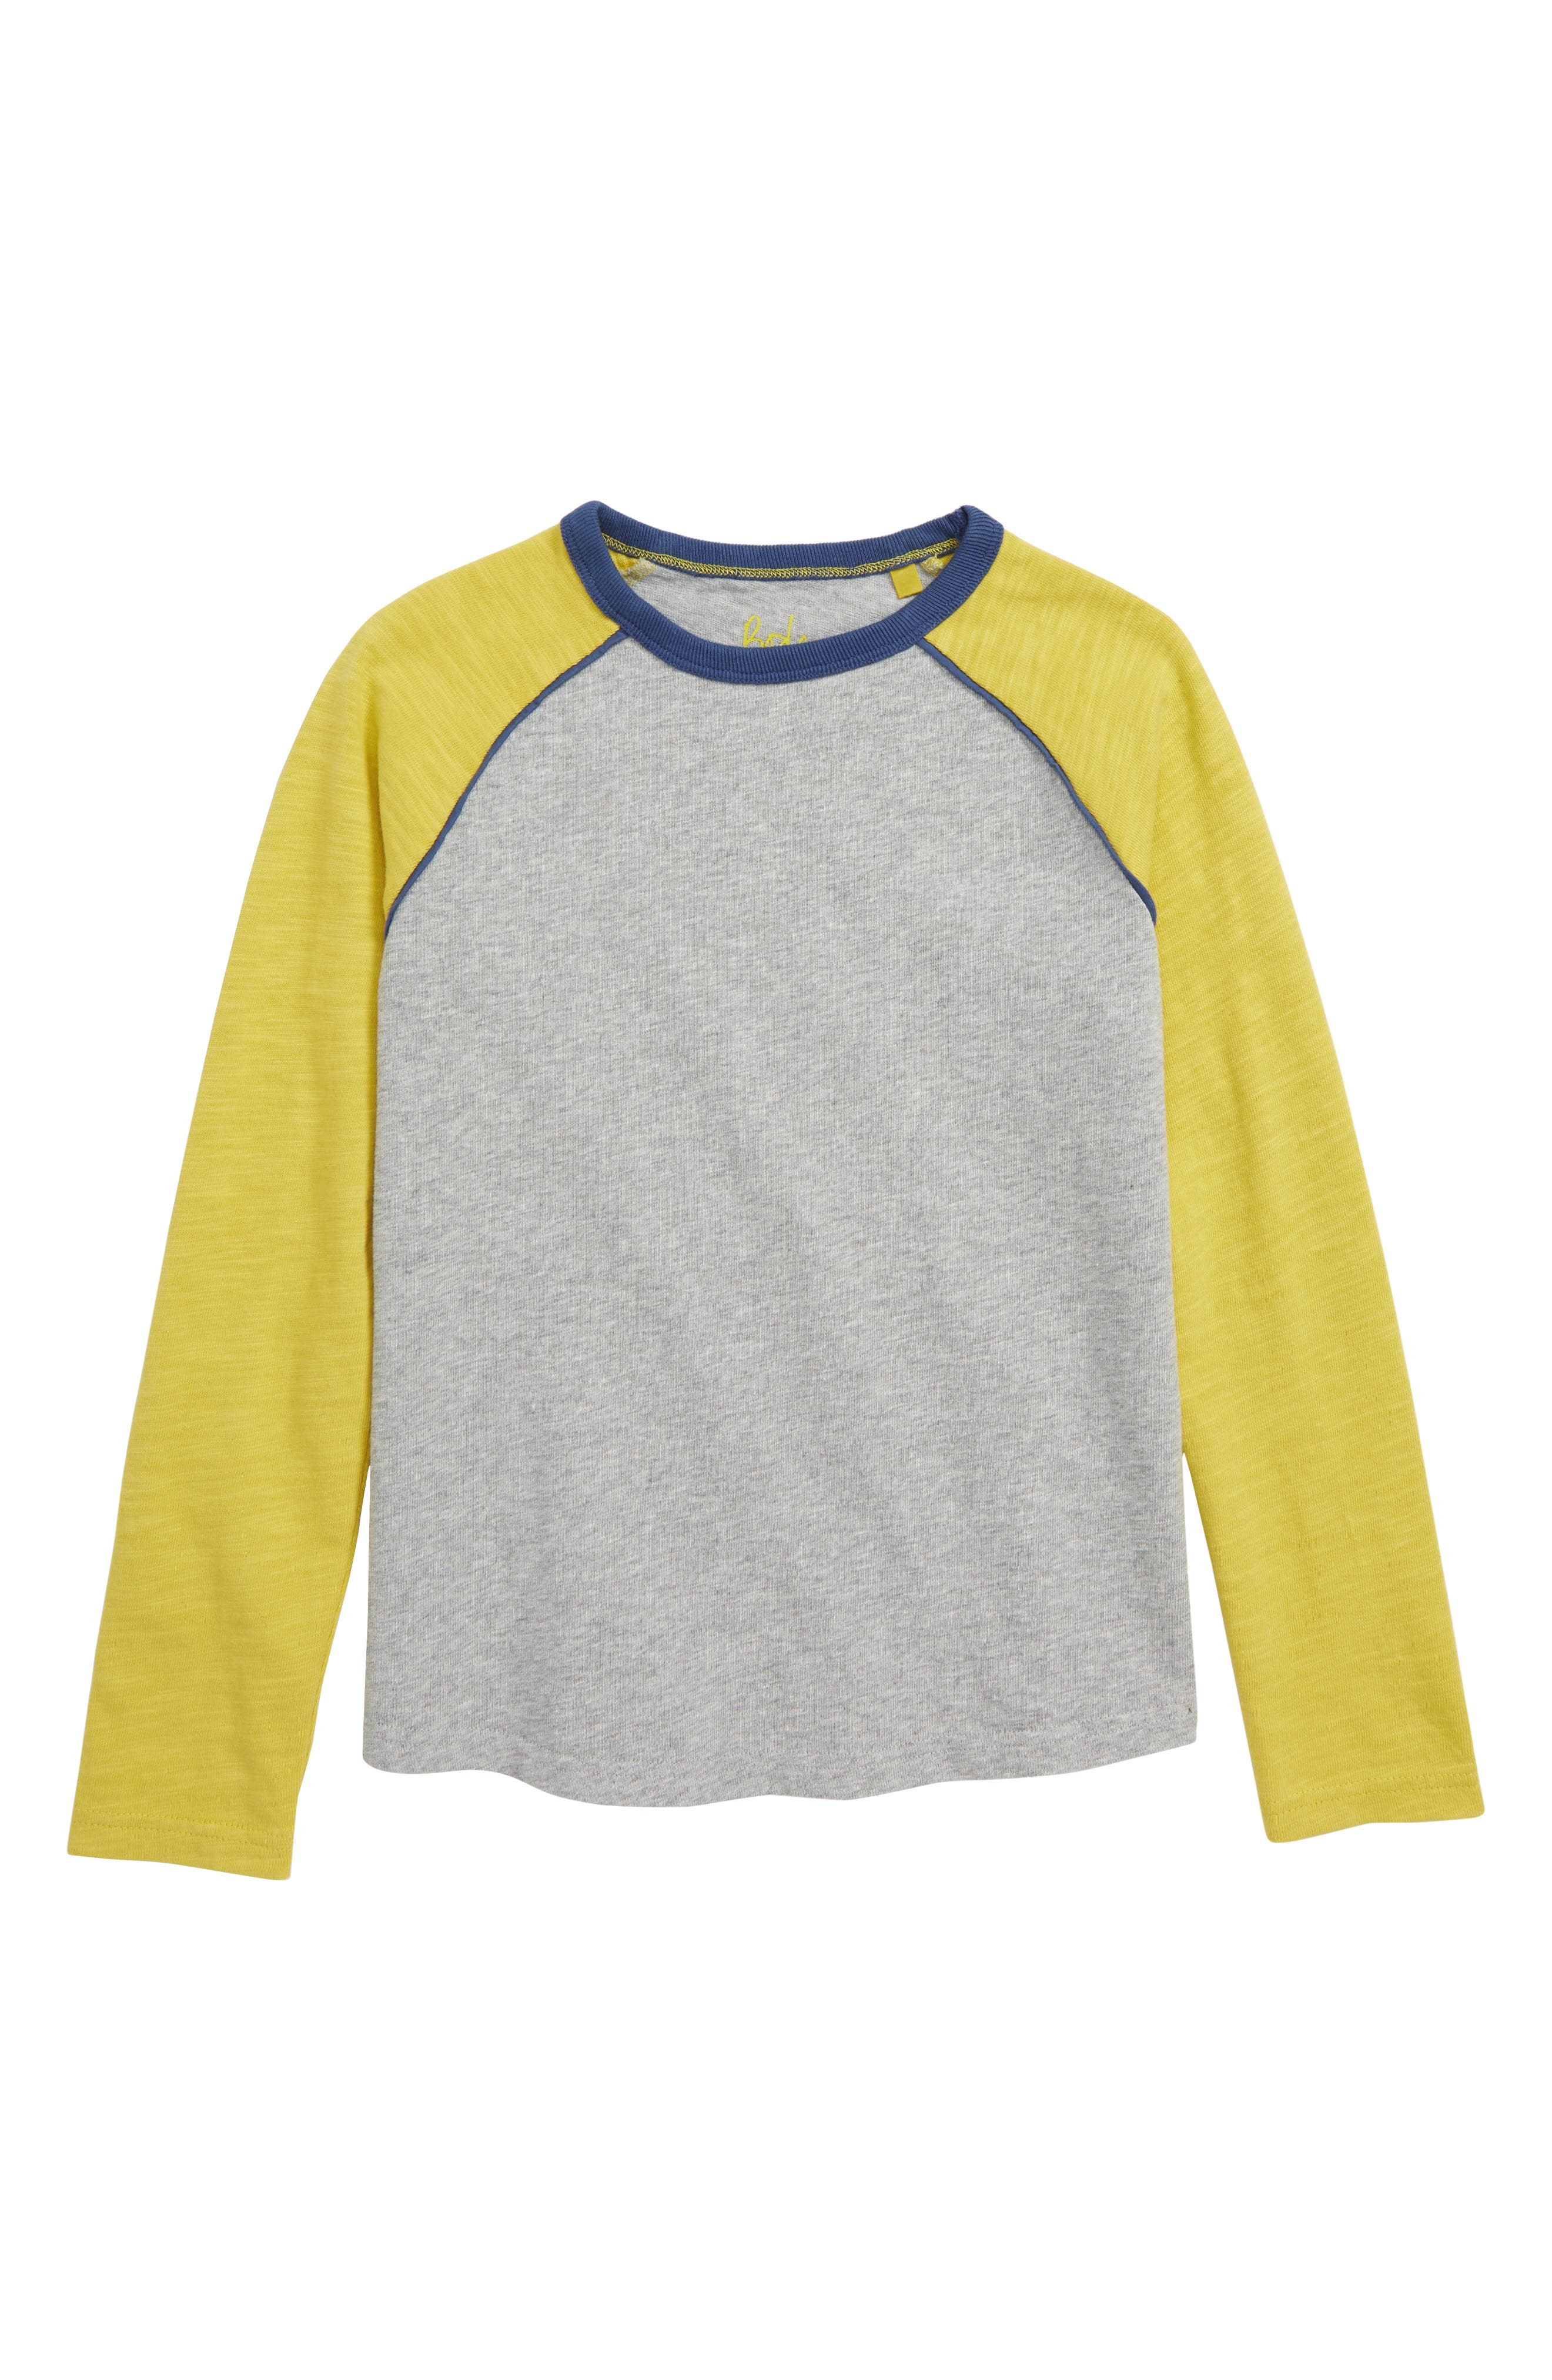 Raglan T-Shirt, Main, color, GREY MARL/ CELERY YELLOW